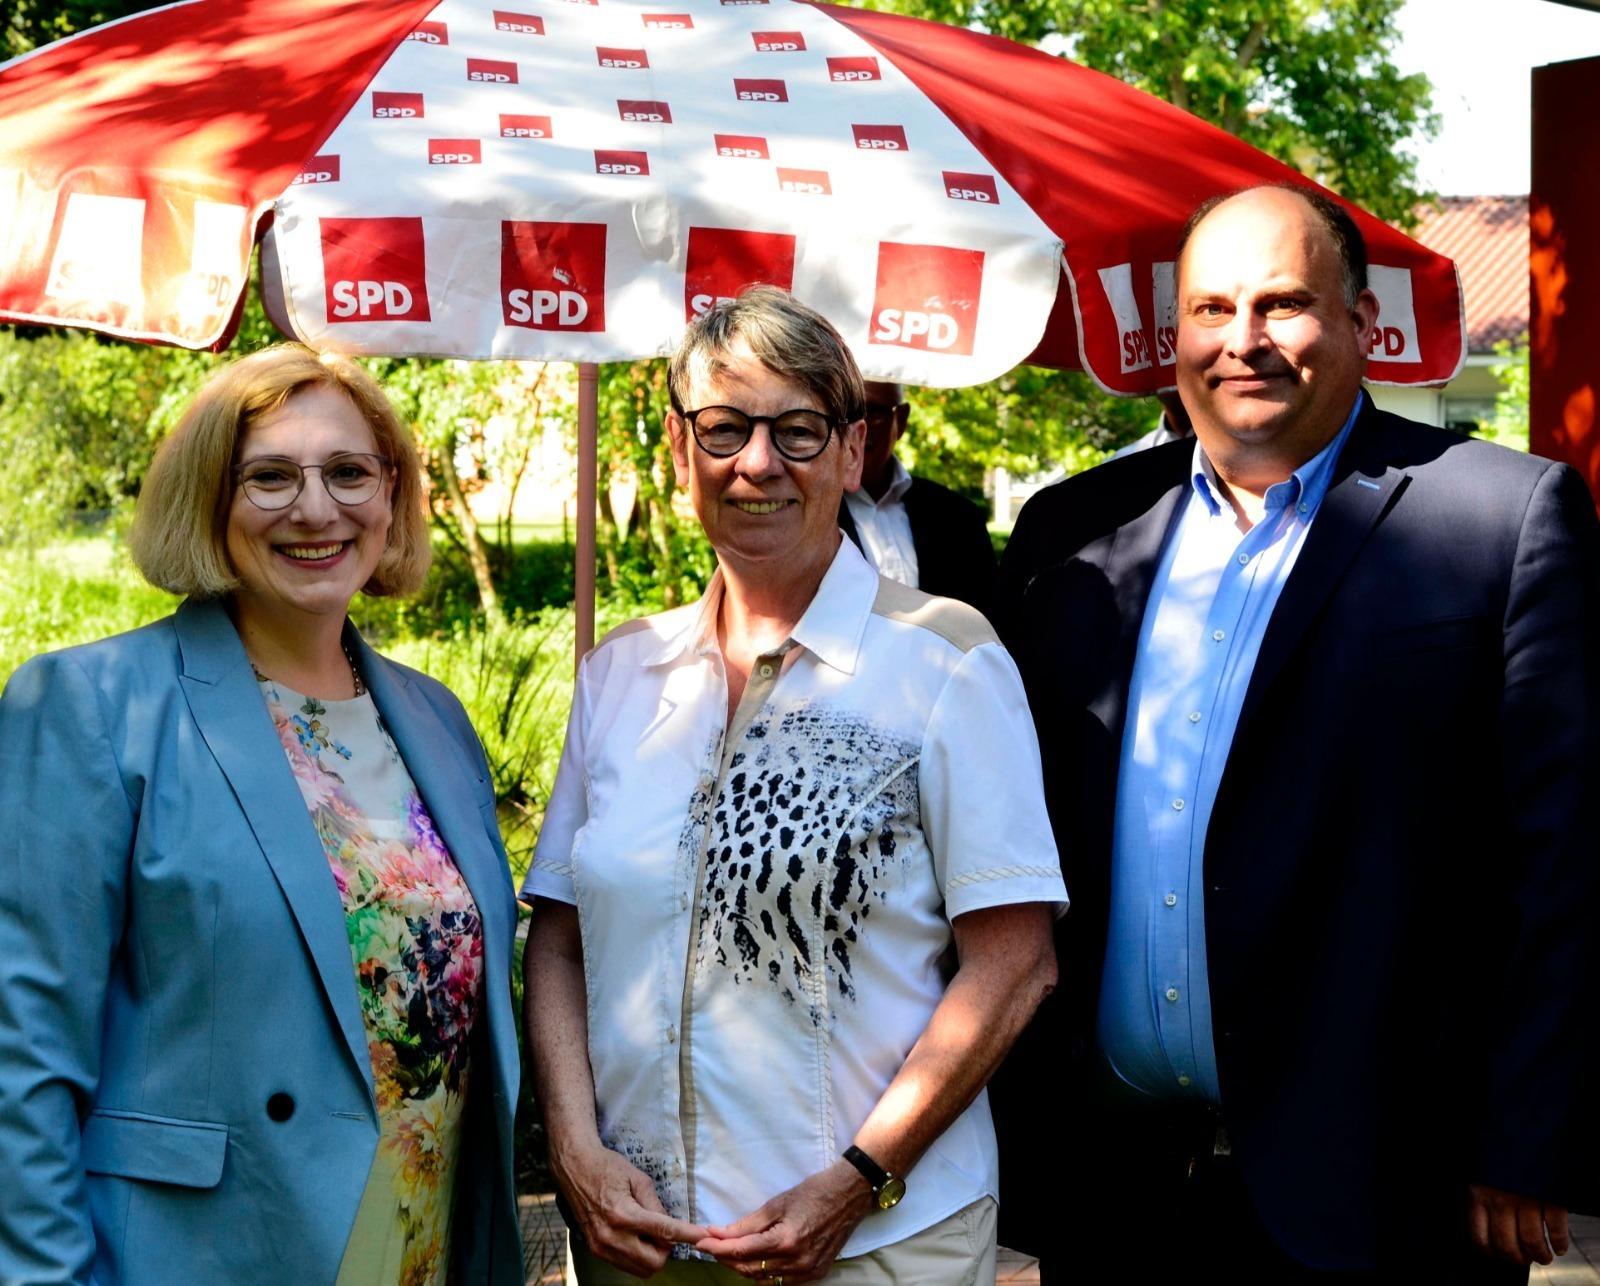 Dr. Daniela De Ridder, Dr. Barbara Hendricks und Christian Otten